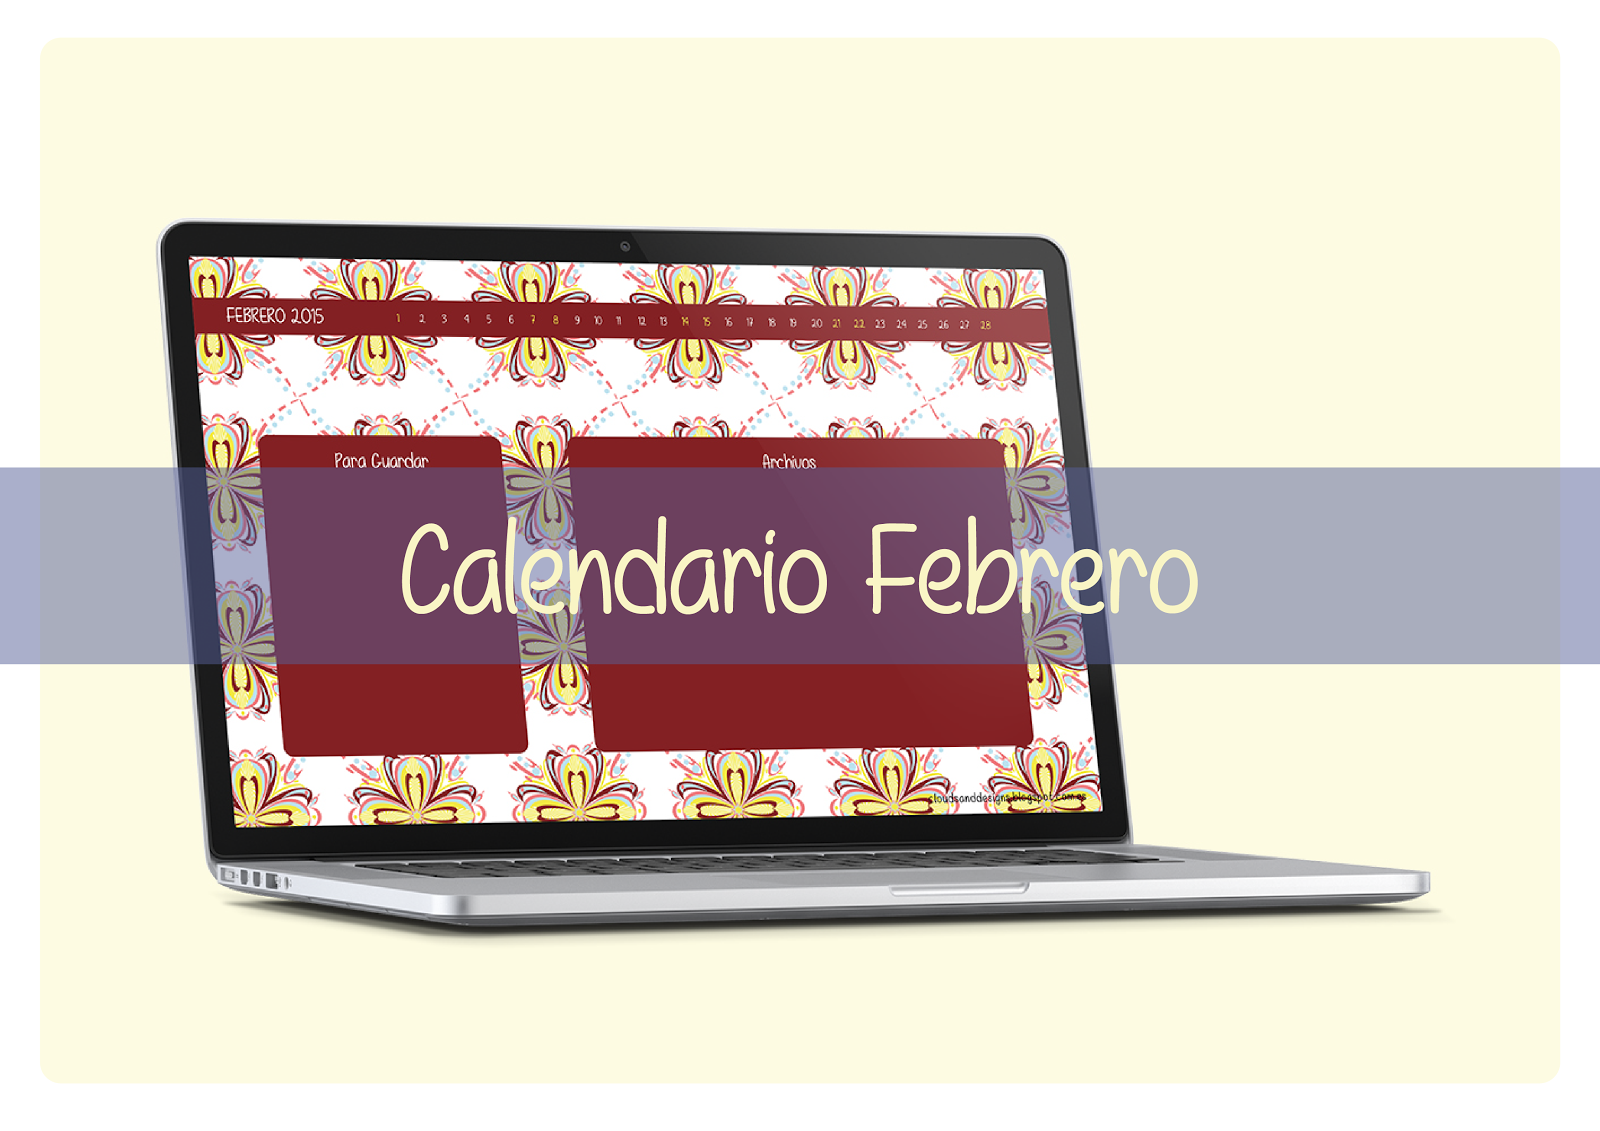 Calendario-Febrero-Clouds